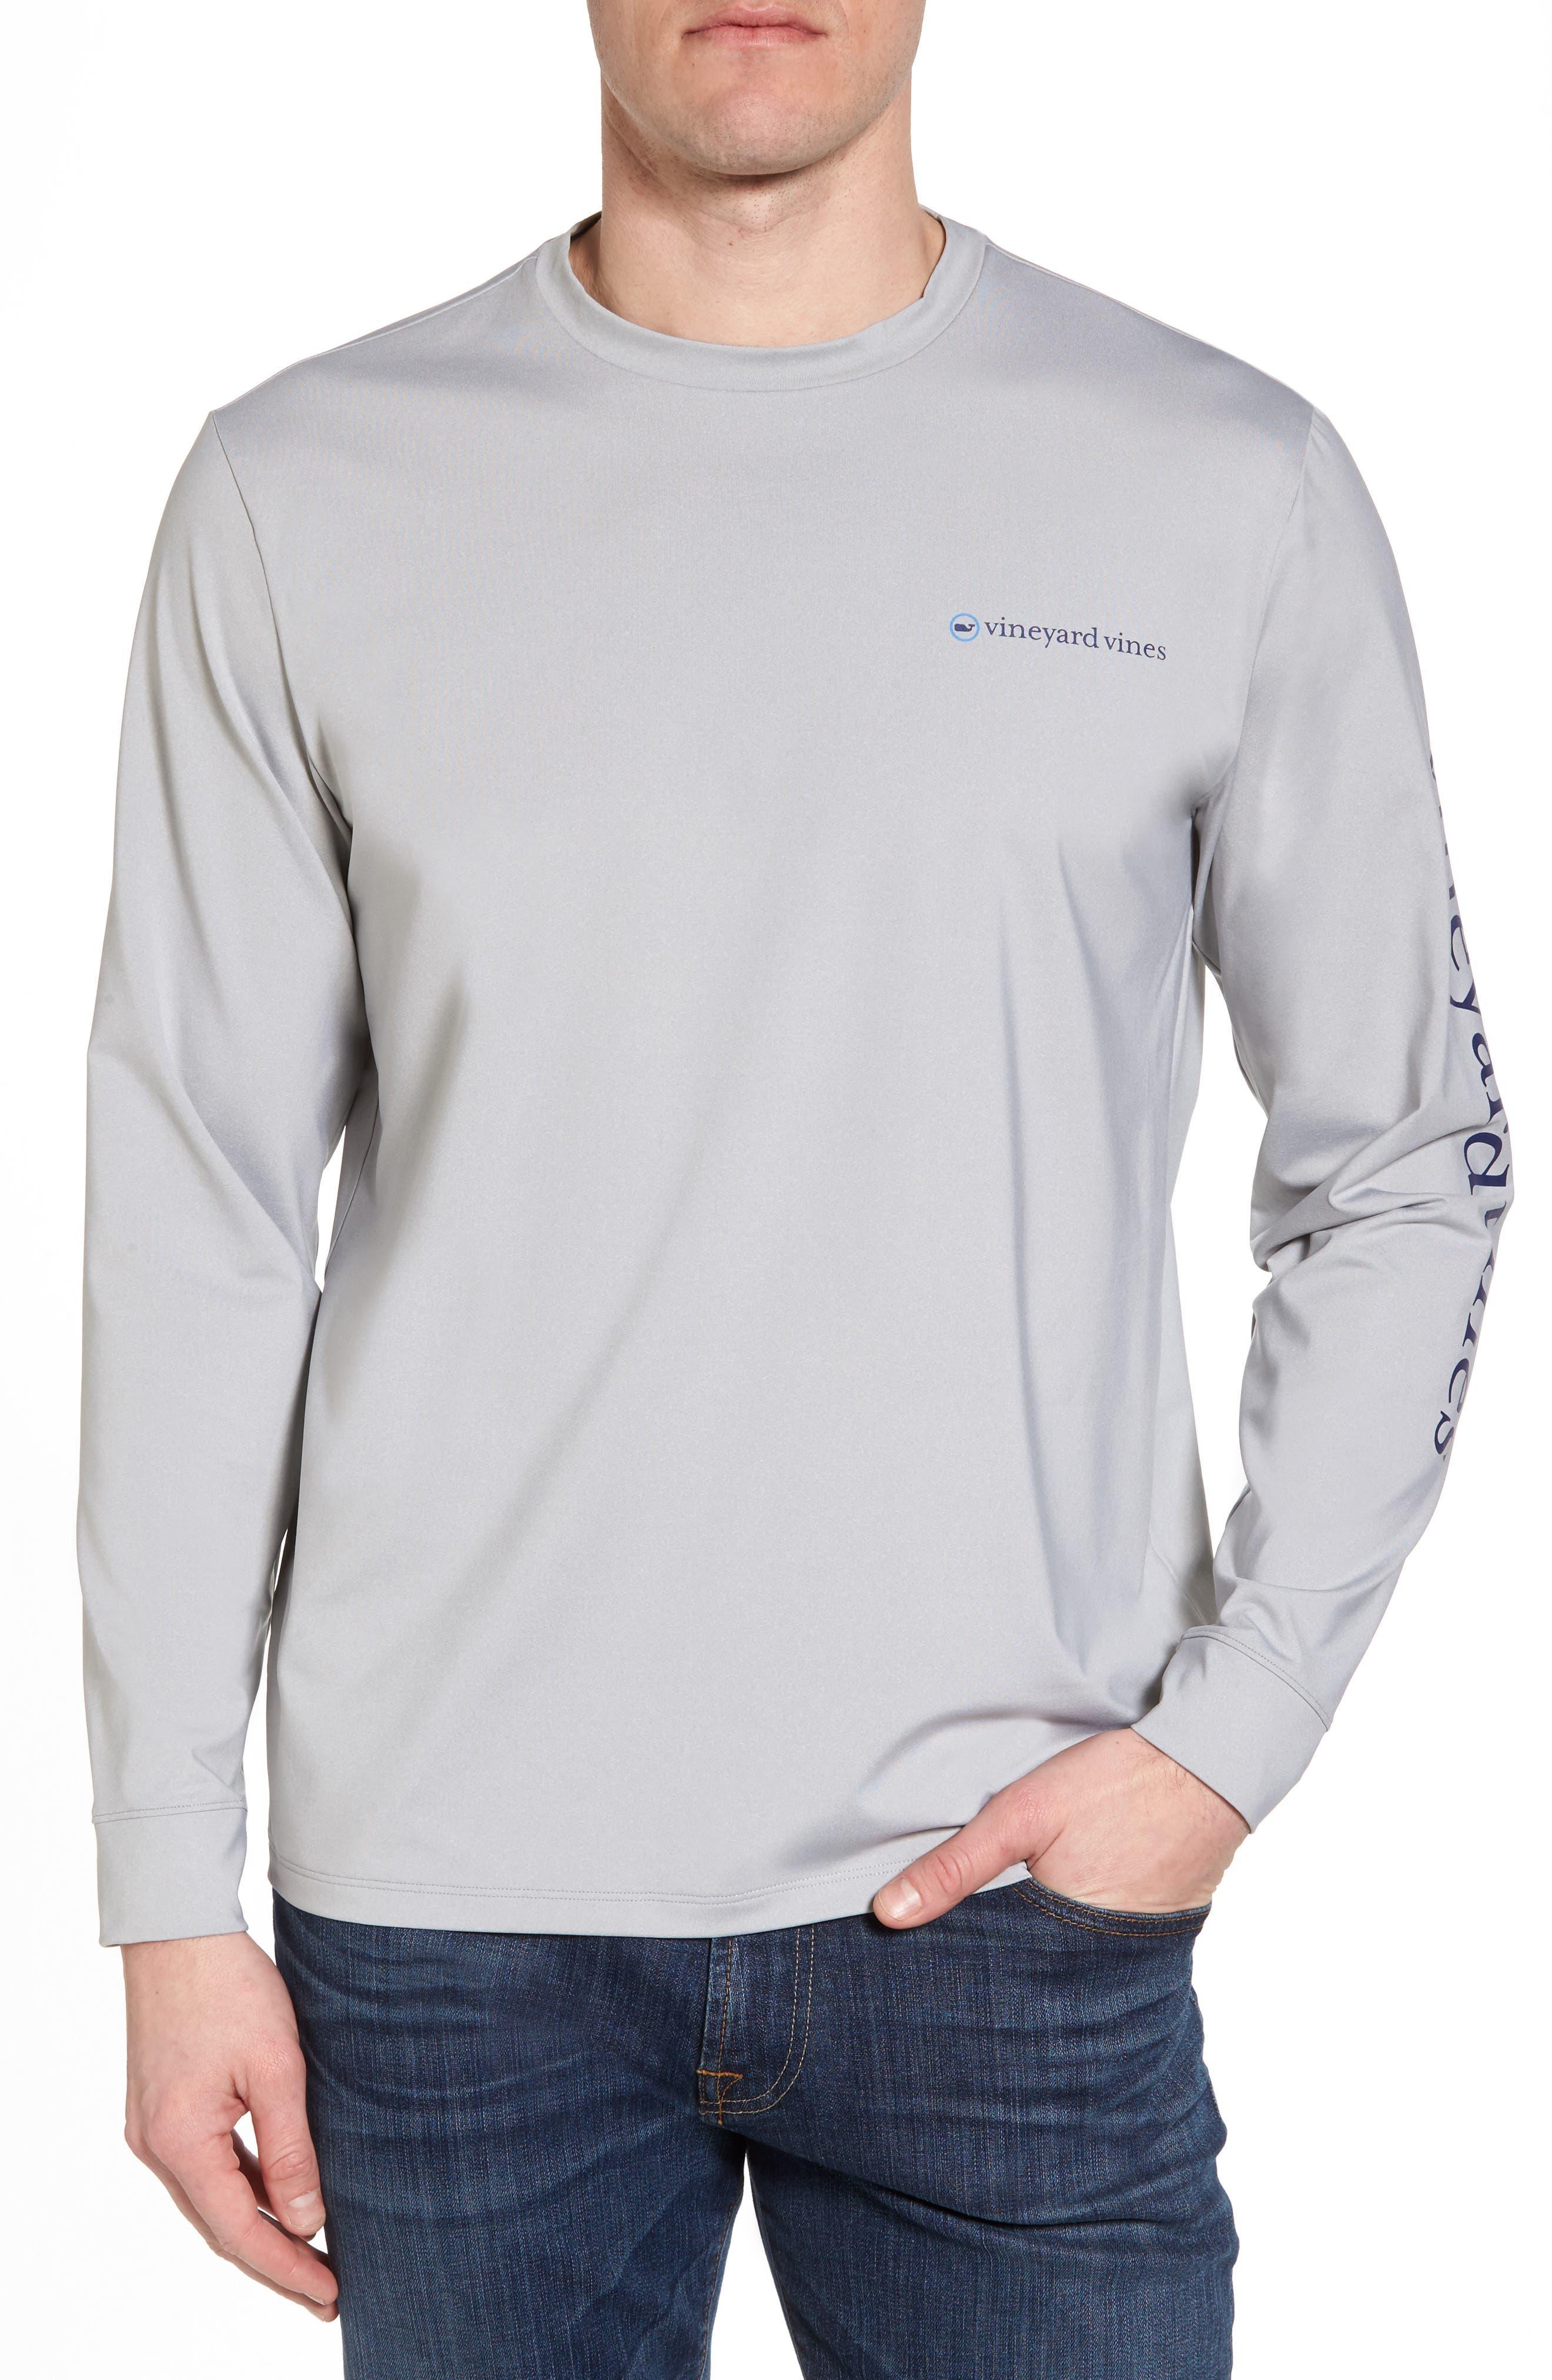 vineyard vines Heathered Long Sleeve Performance T-Shirt